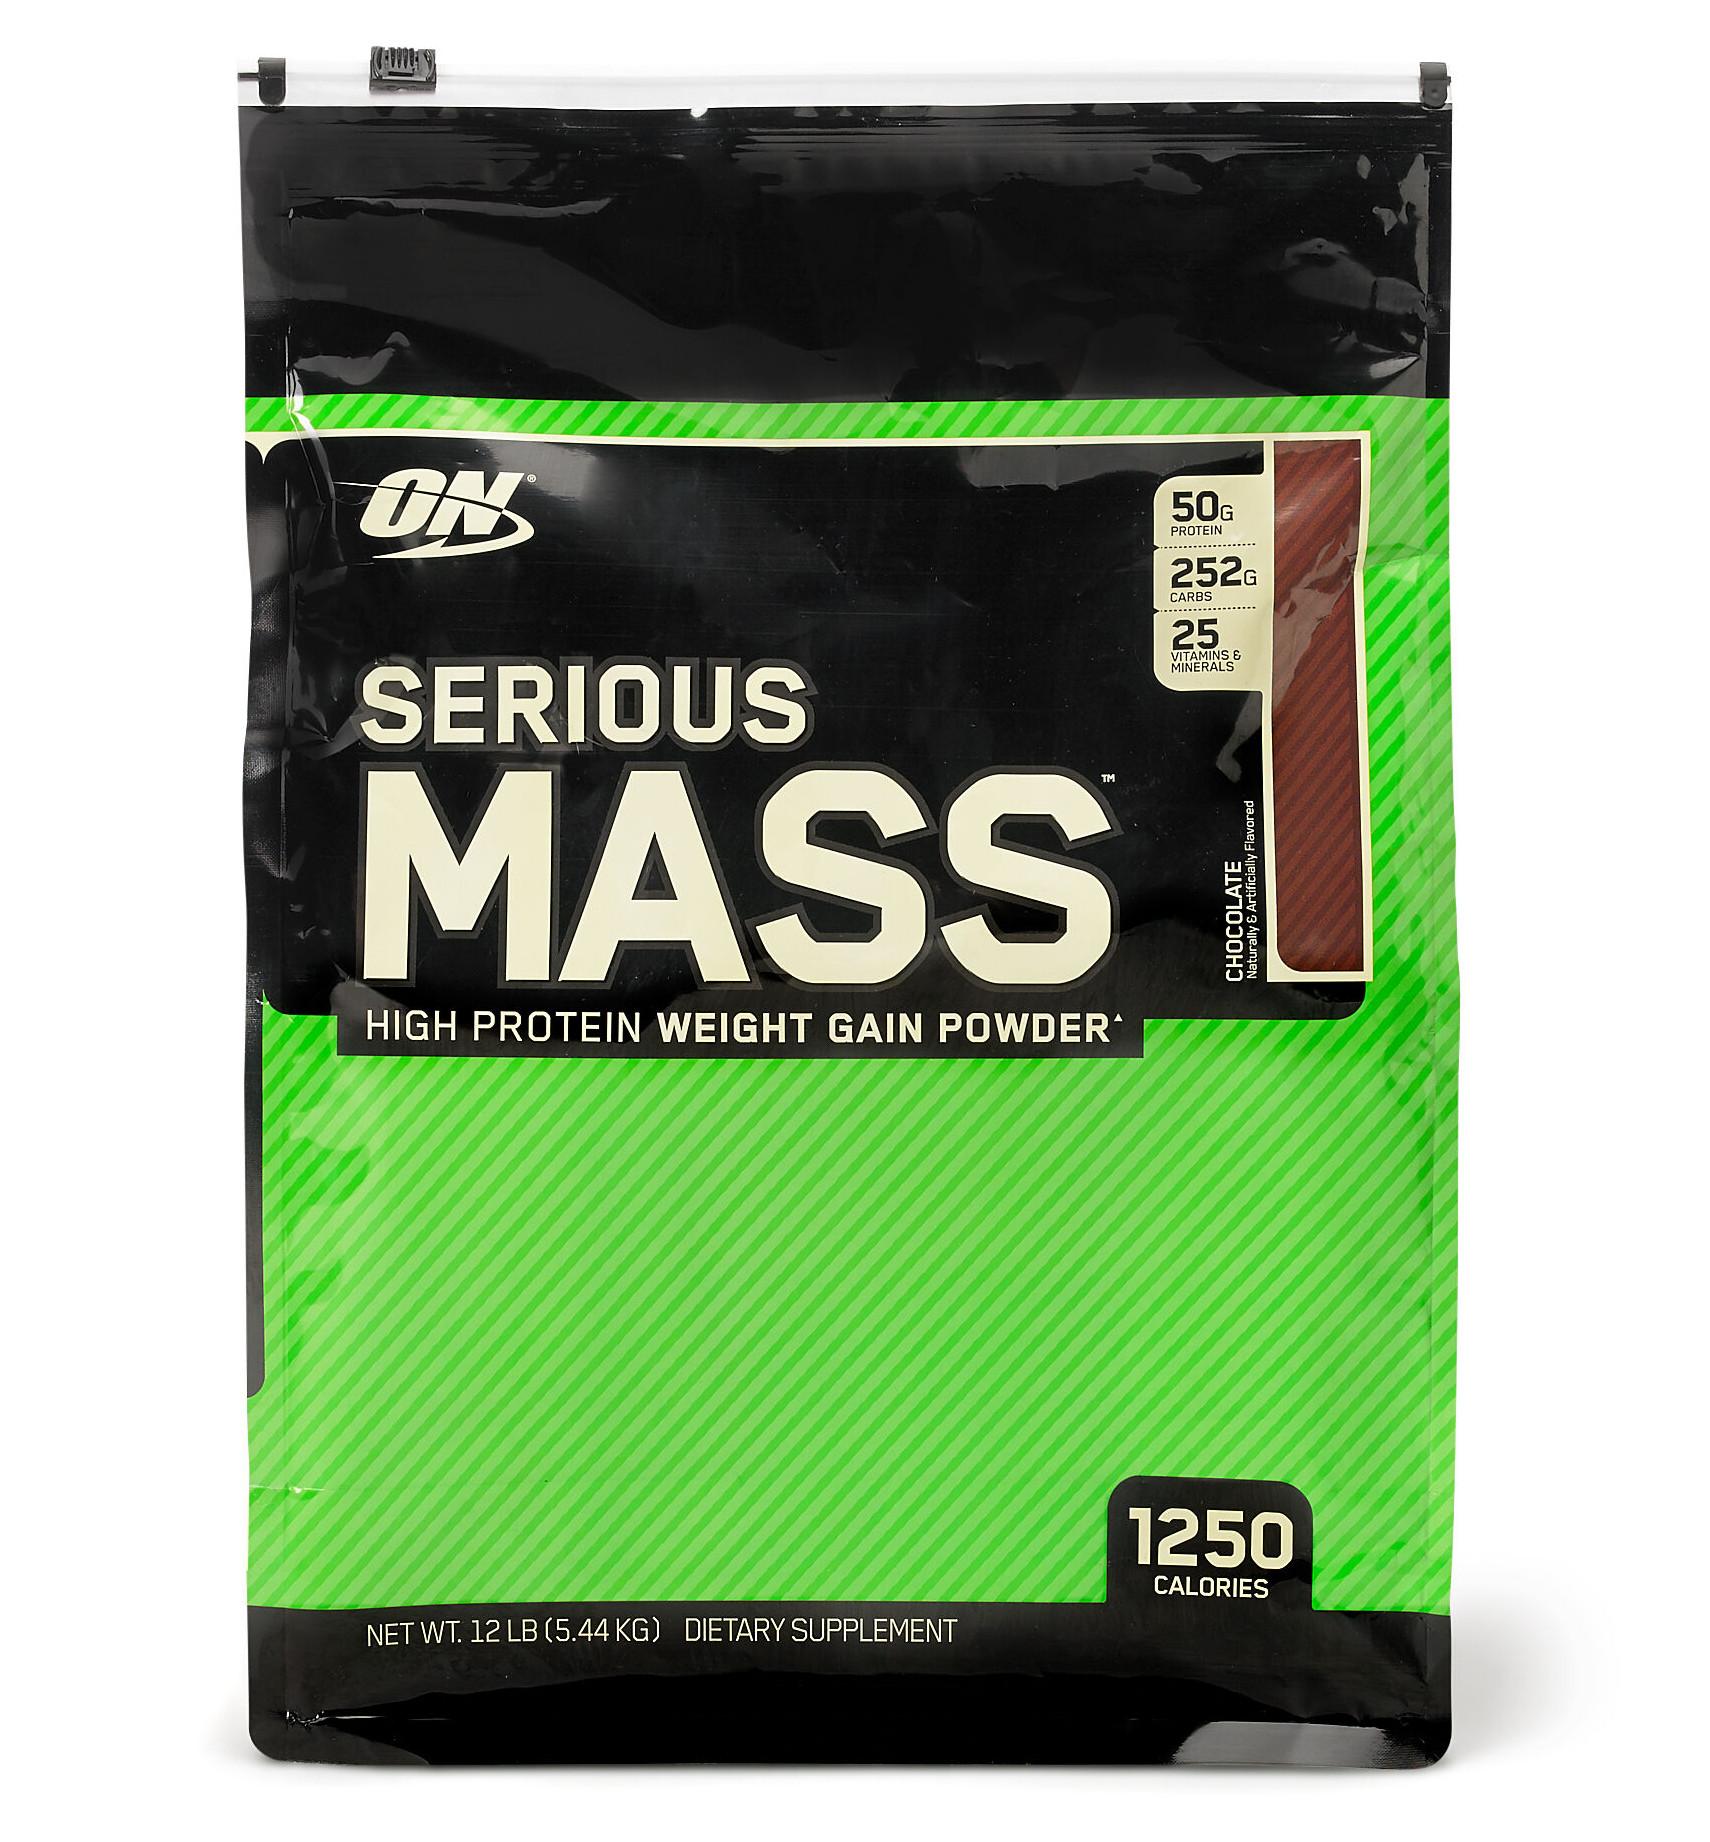 Serious Mass Weight Gainer Powder Strawberry Flavor - Protein Shake Recipe